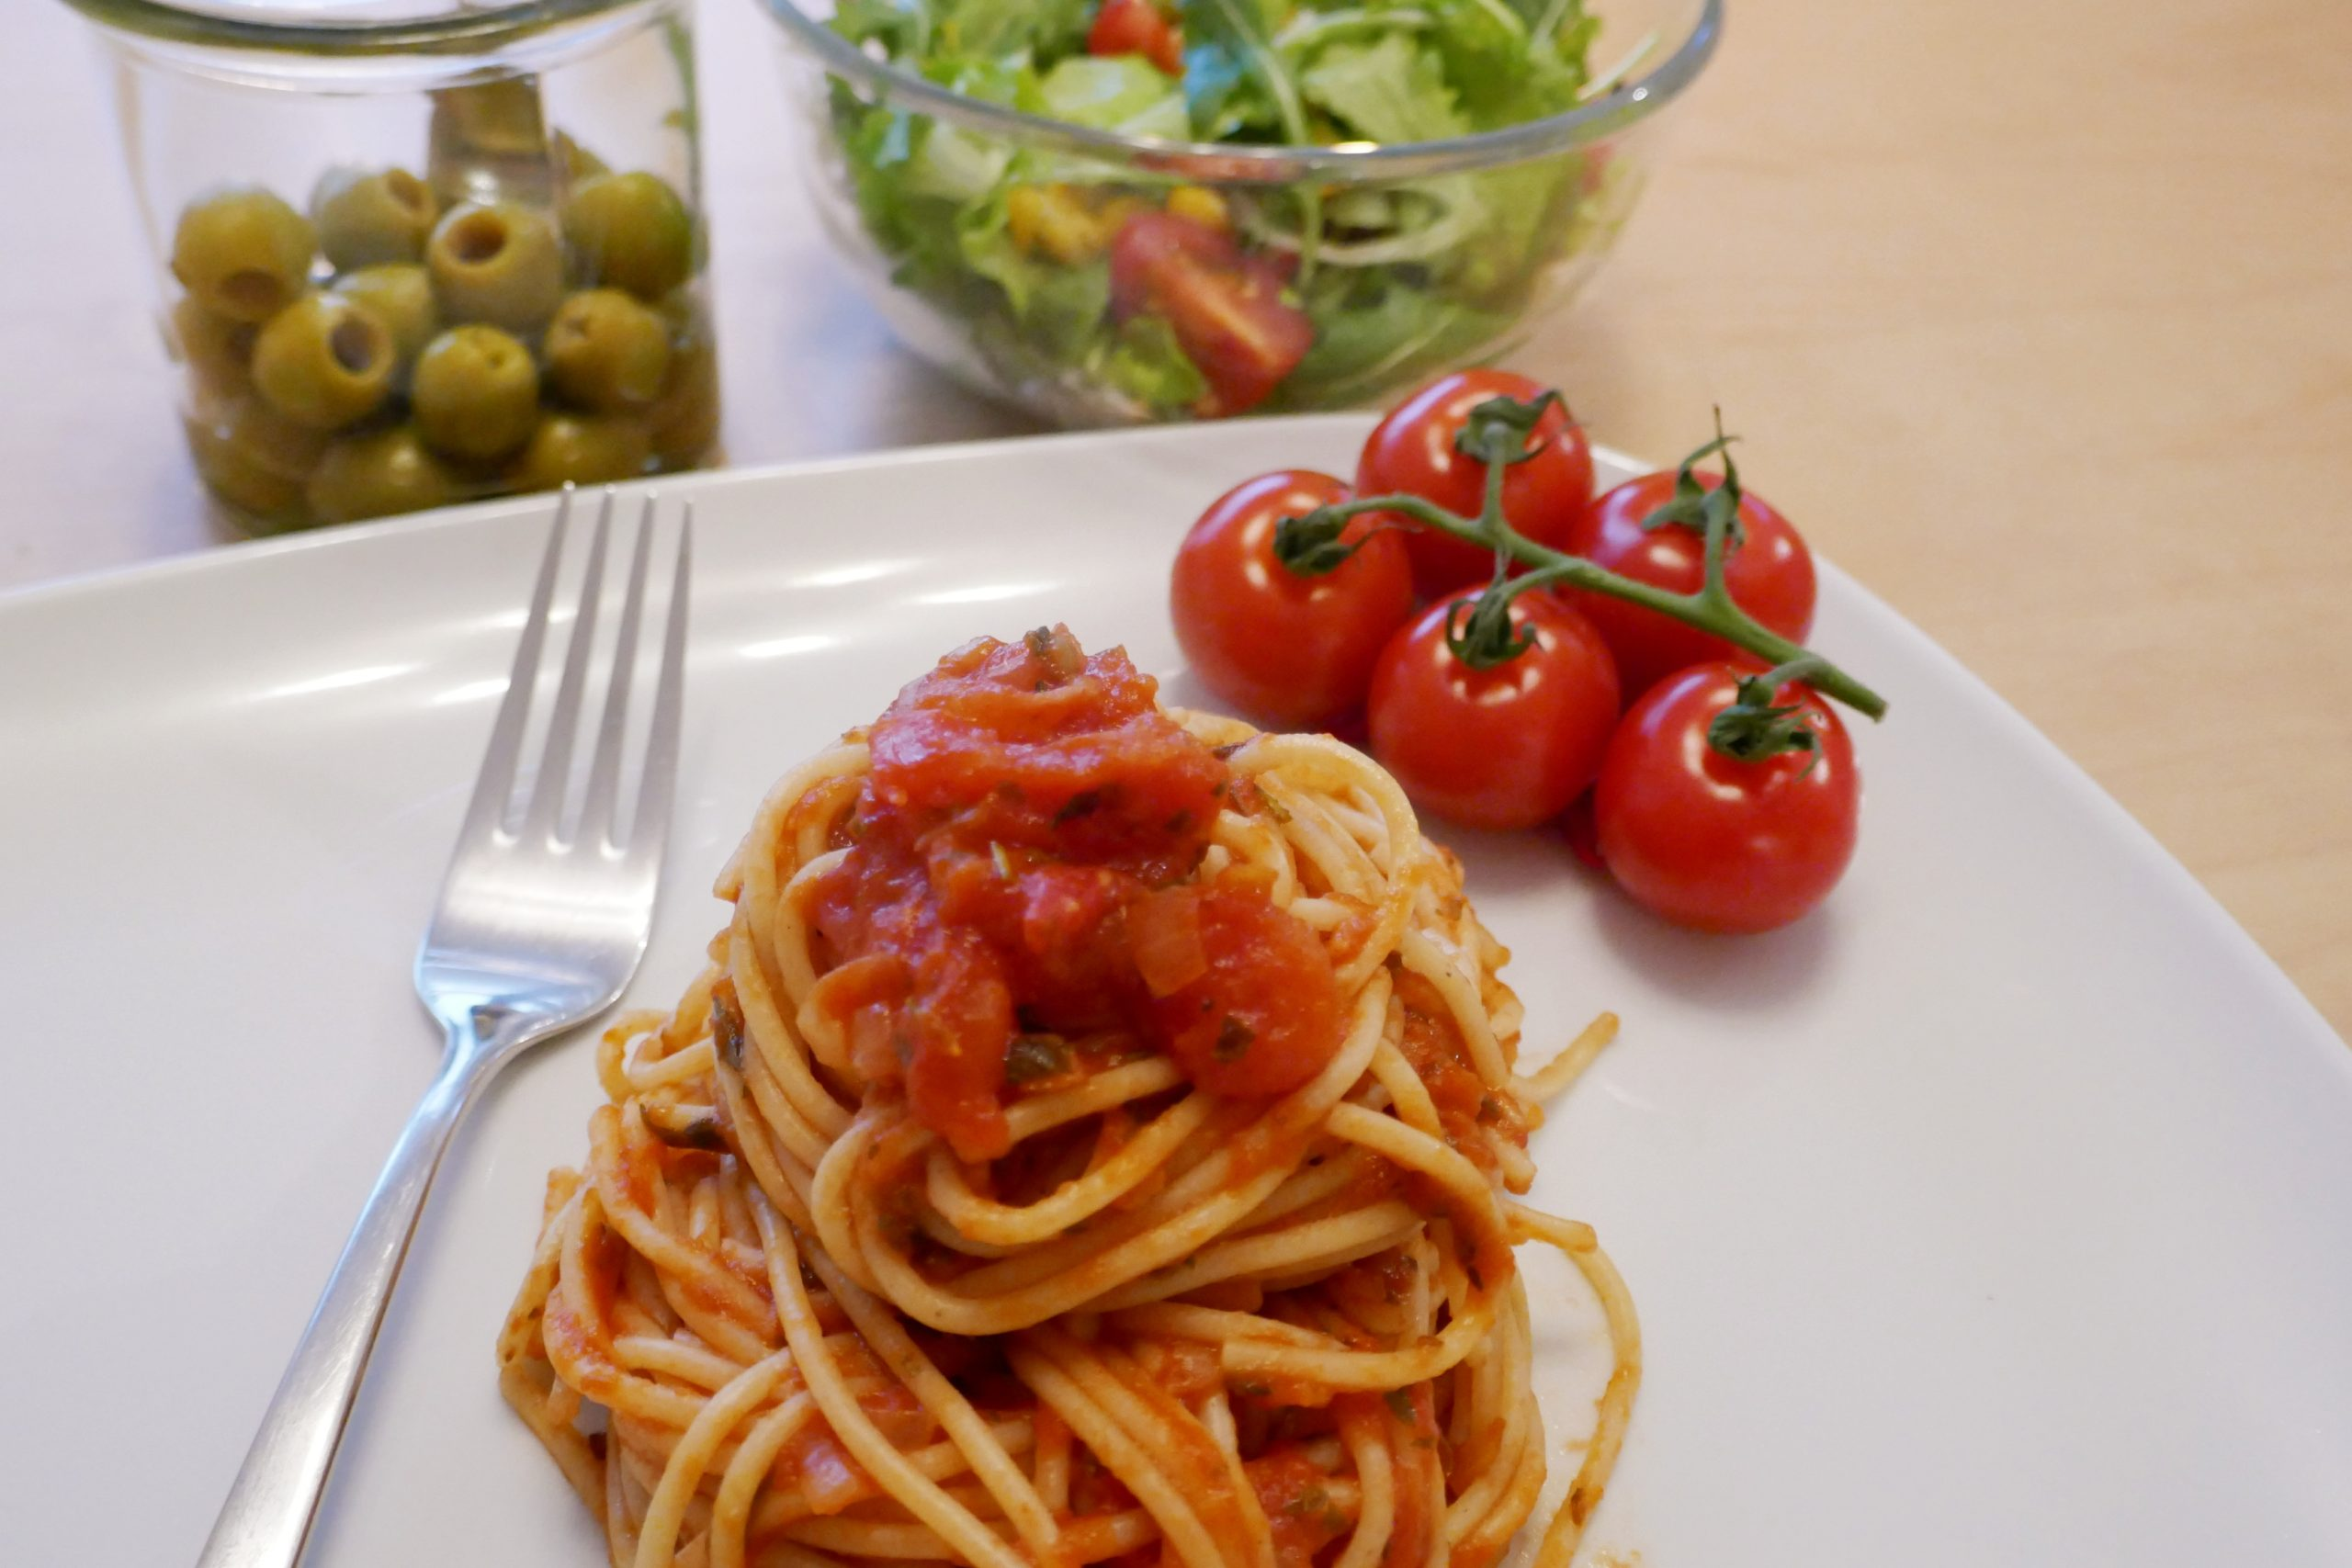 Spaghetti alla Napoletana, Spaghetti al Pomodoro, Spaghetti ai pomodori, Spaghetti mit Tomatensauce, Pasta, Cocktailtomaten, Oliven, Salat